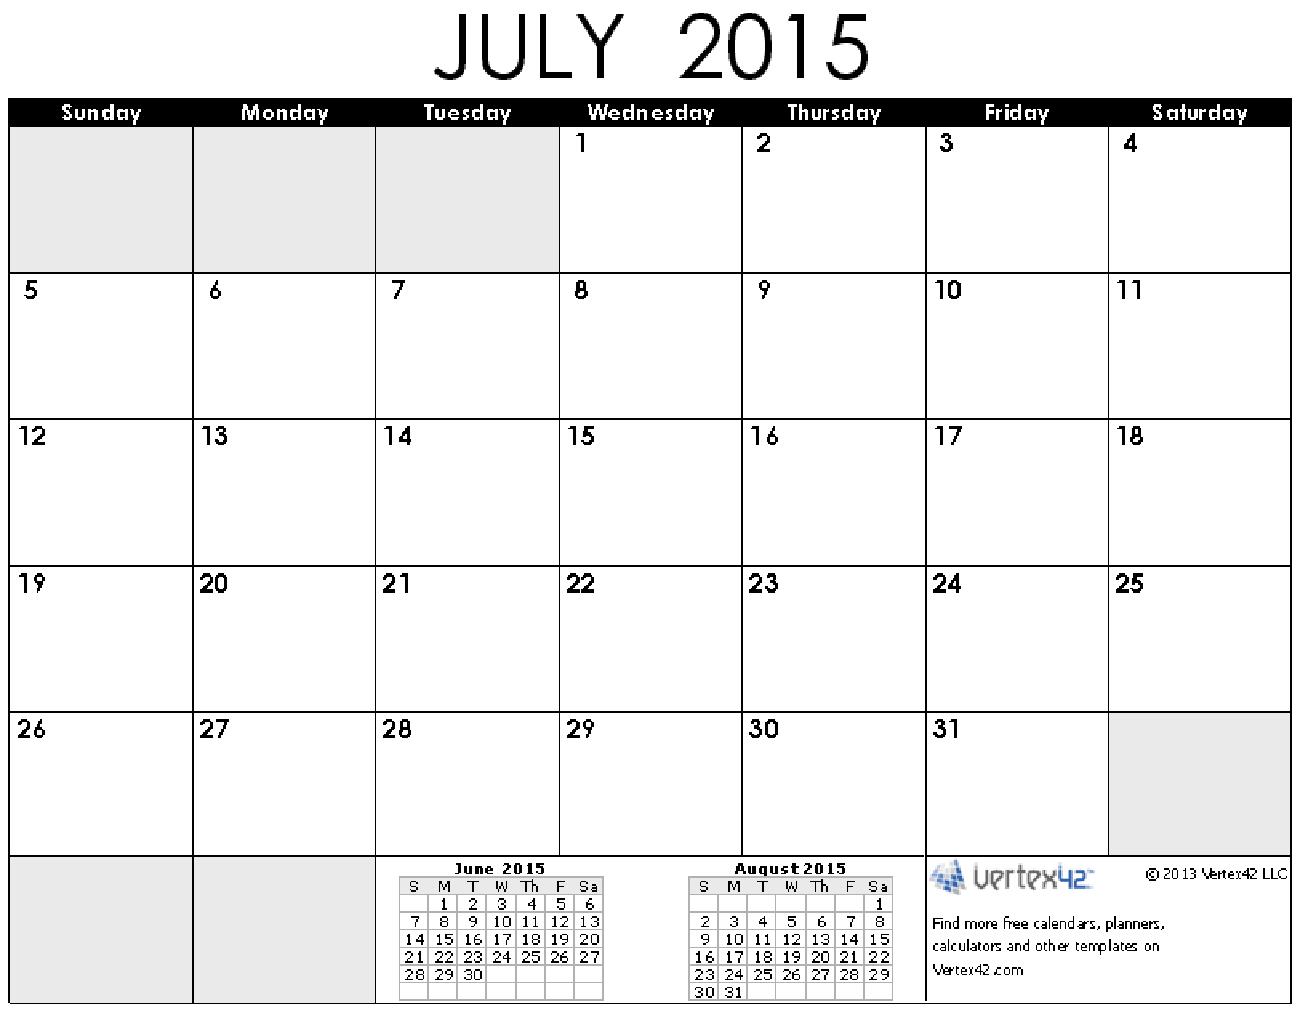 July 2015 Calendar 7a Calendar Printables Printable Calendar July Free Printable Calendar Templates